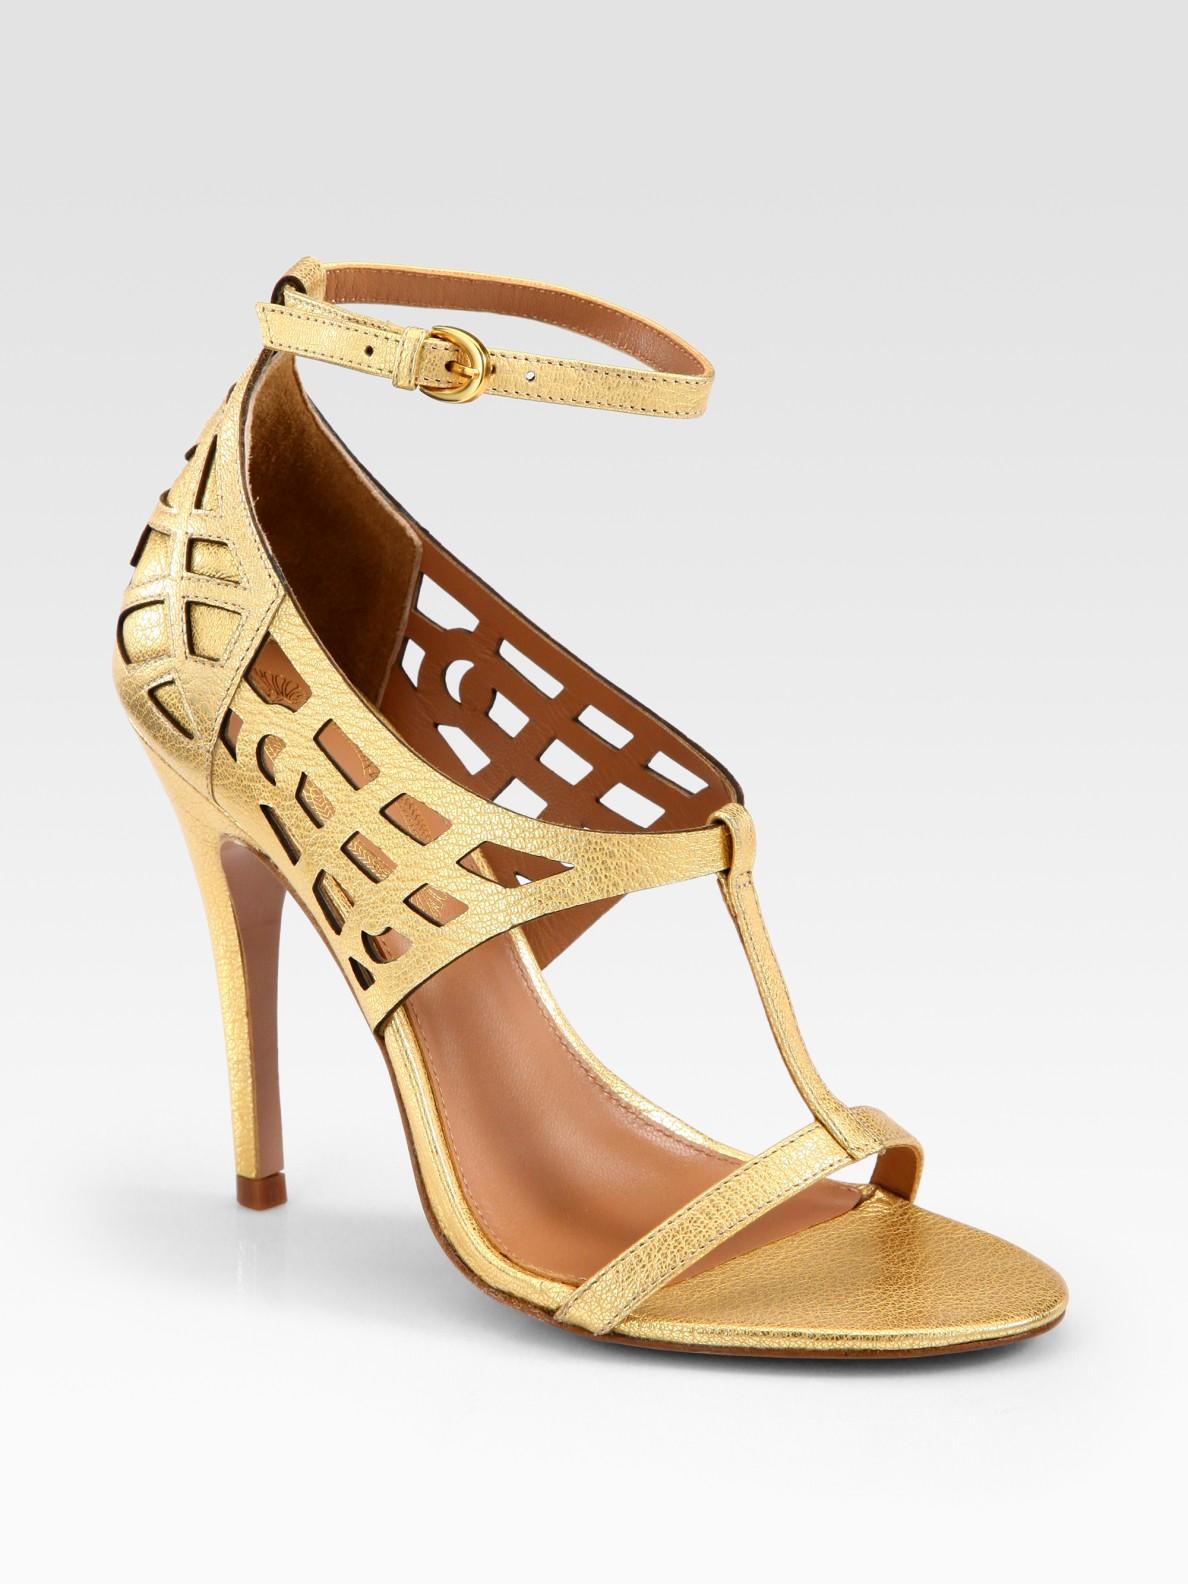 Elie Tahari Metallic Leather Tstrap Cage Sandals In